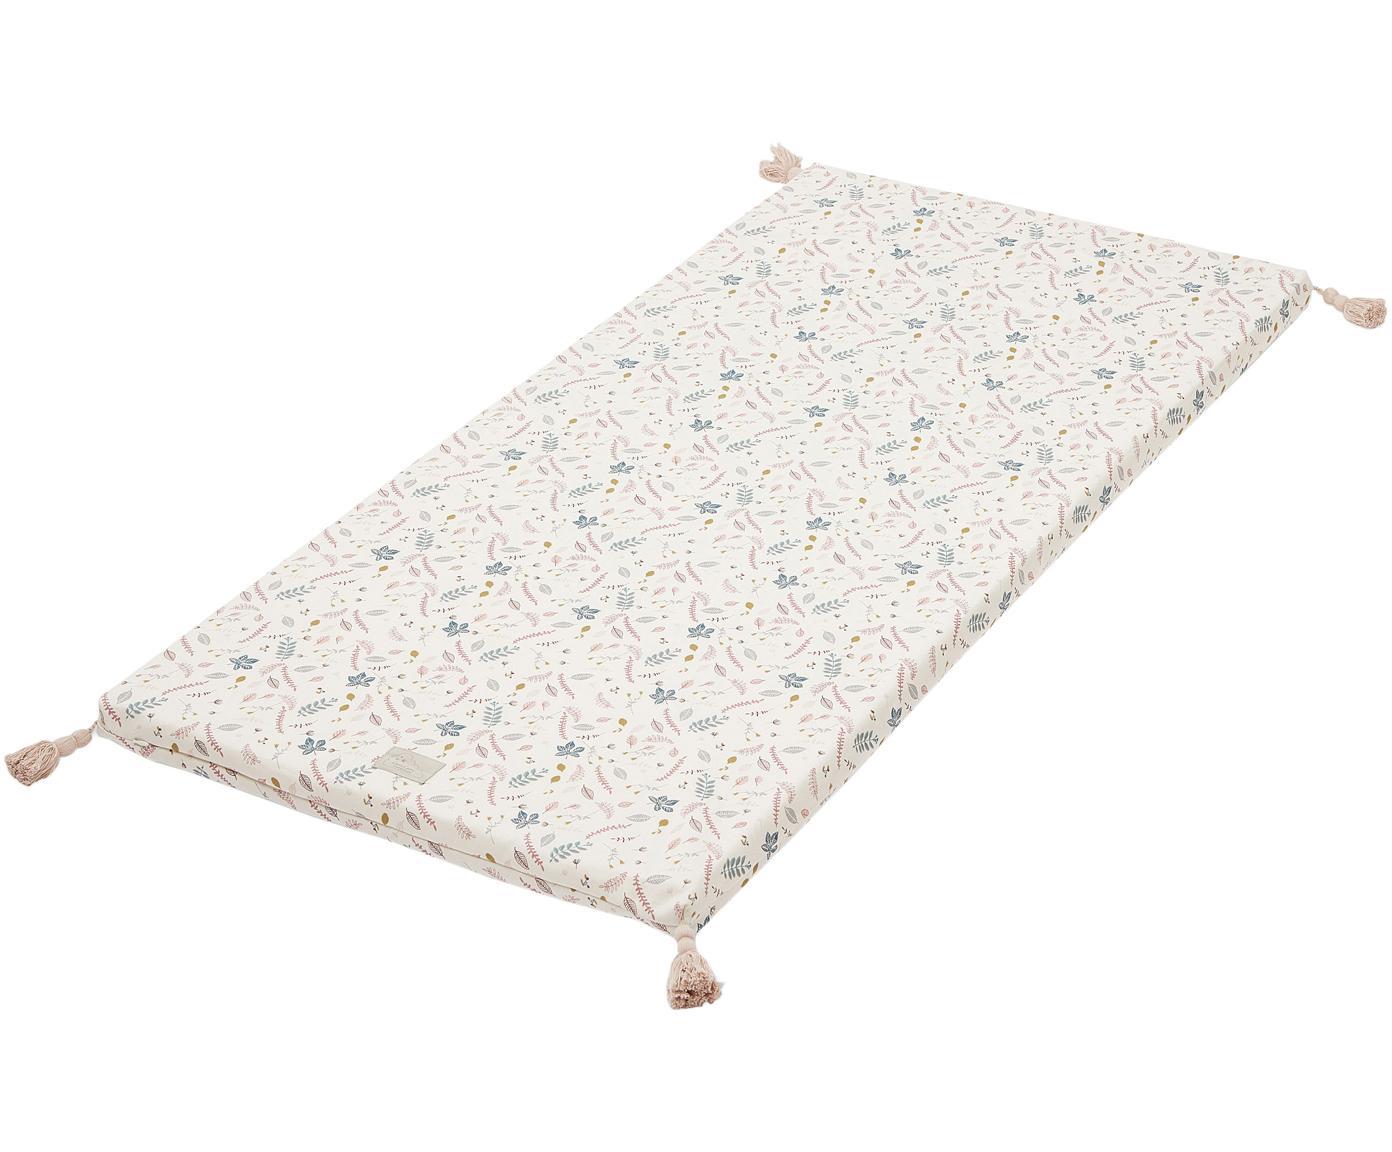 Hrací deka zorganické bavlny Pressed Leaves, Krémová, růžová, modrá, šedá, žlutá